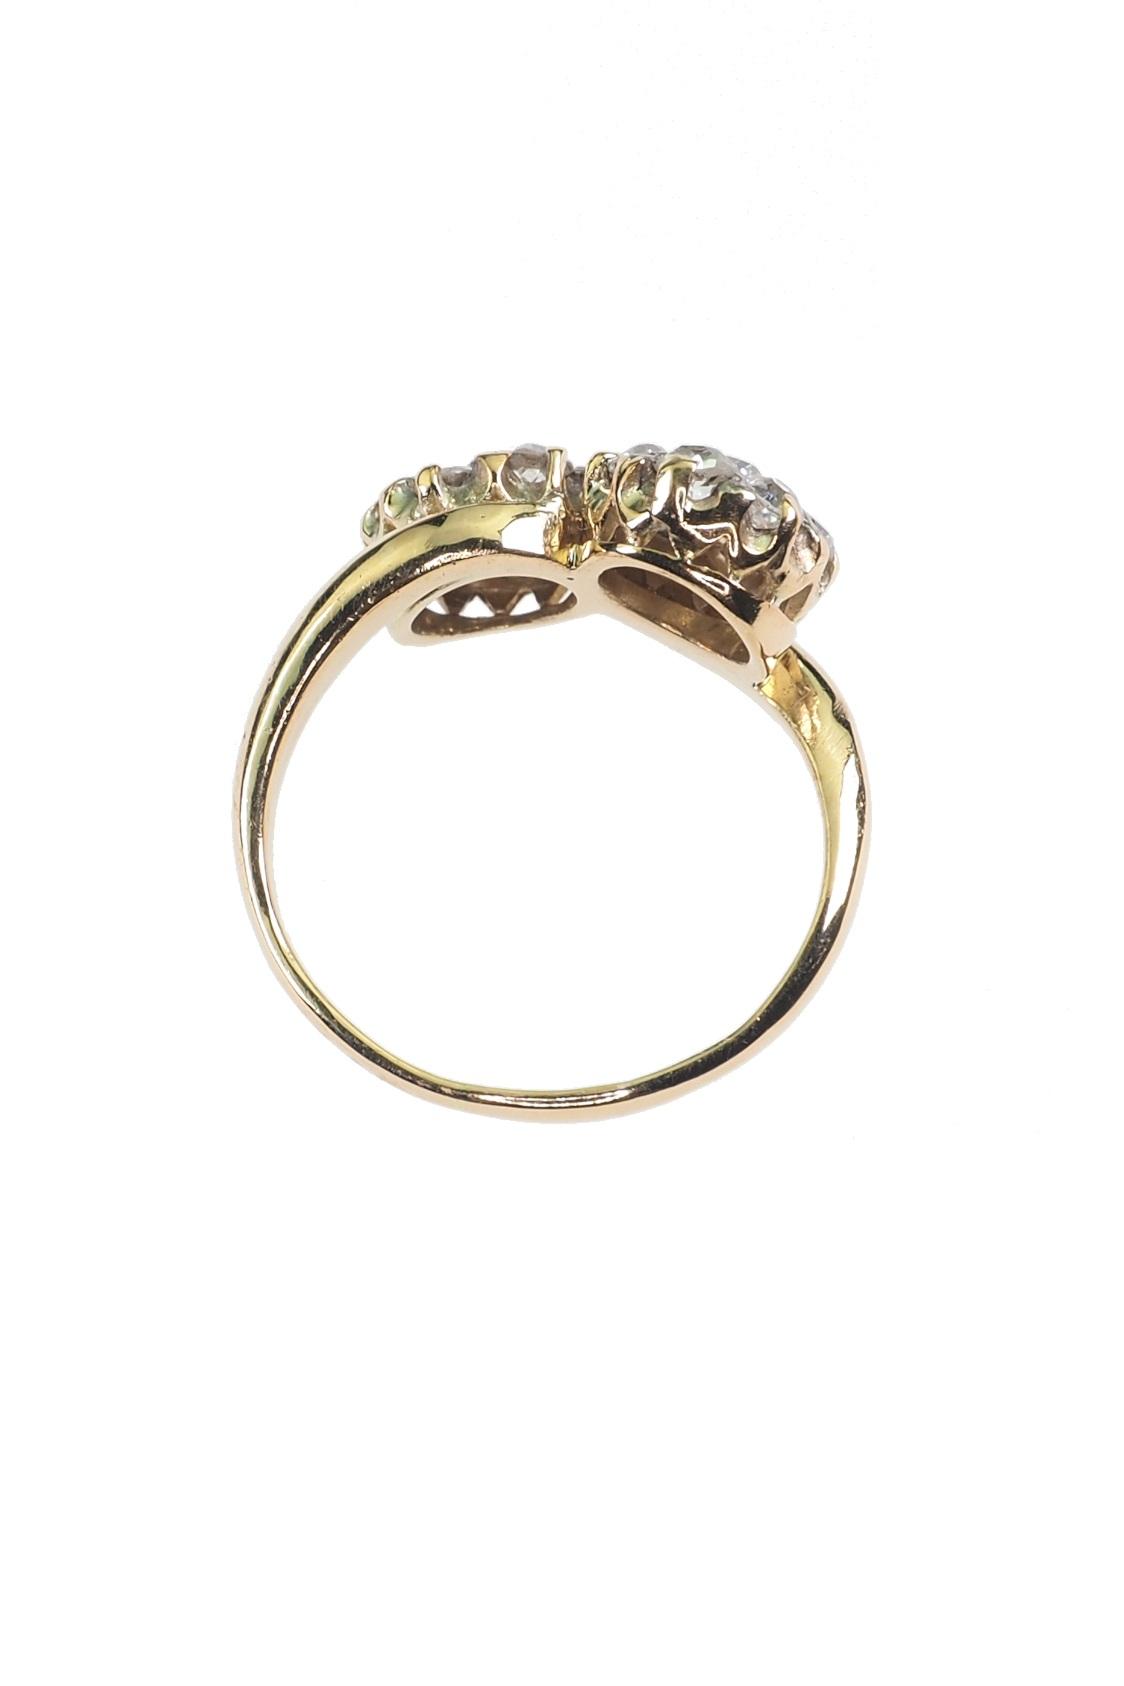 antike-Verlobungsringe-kaufen-2690b